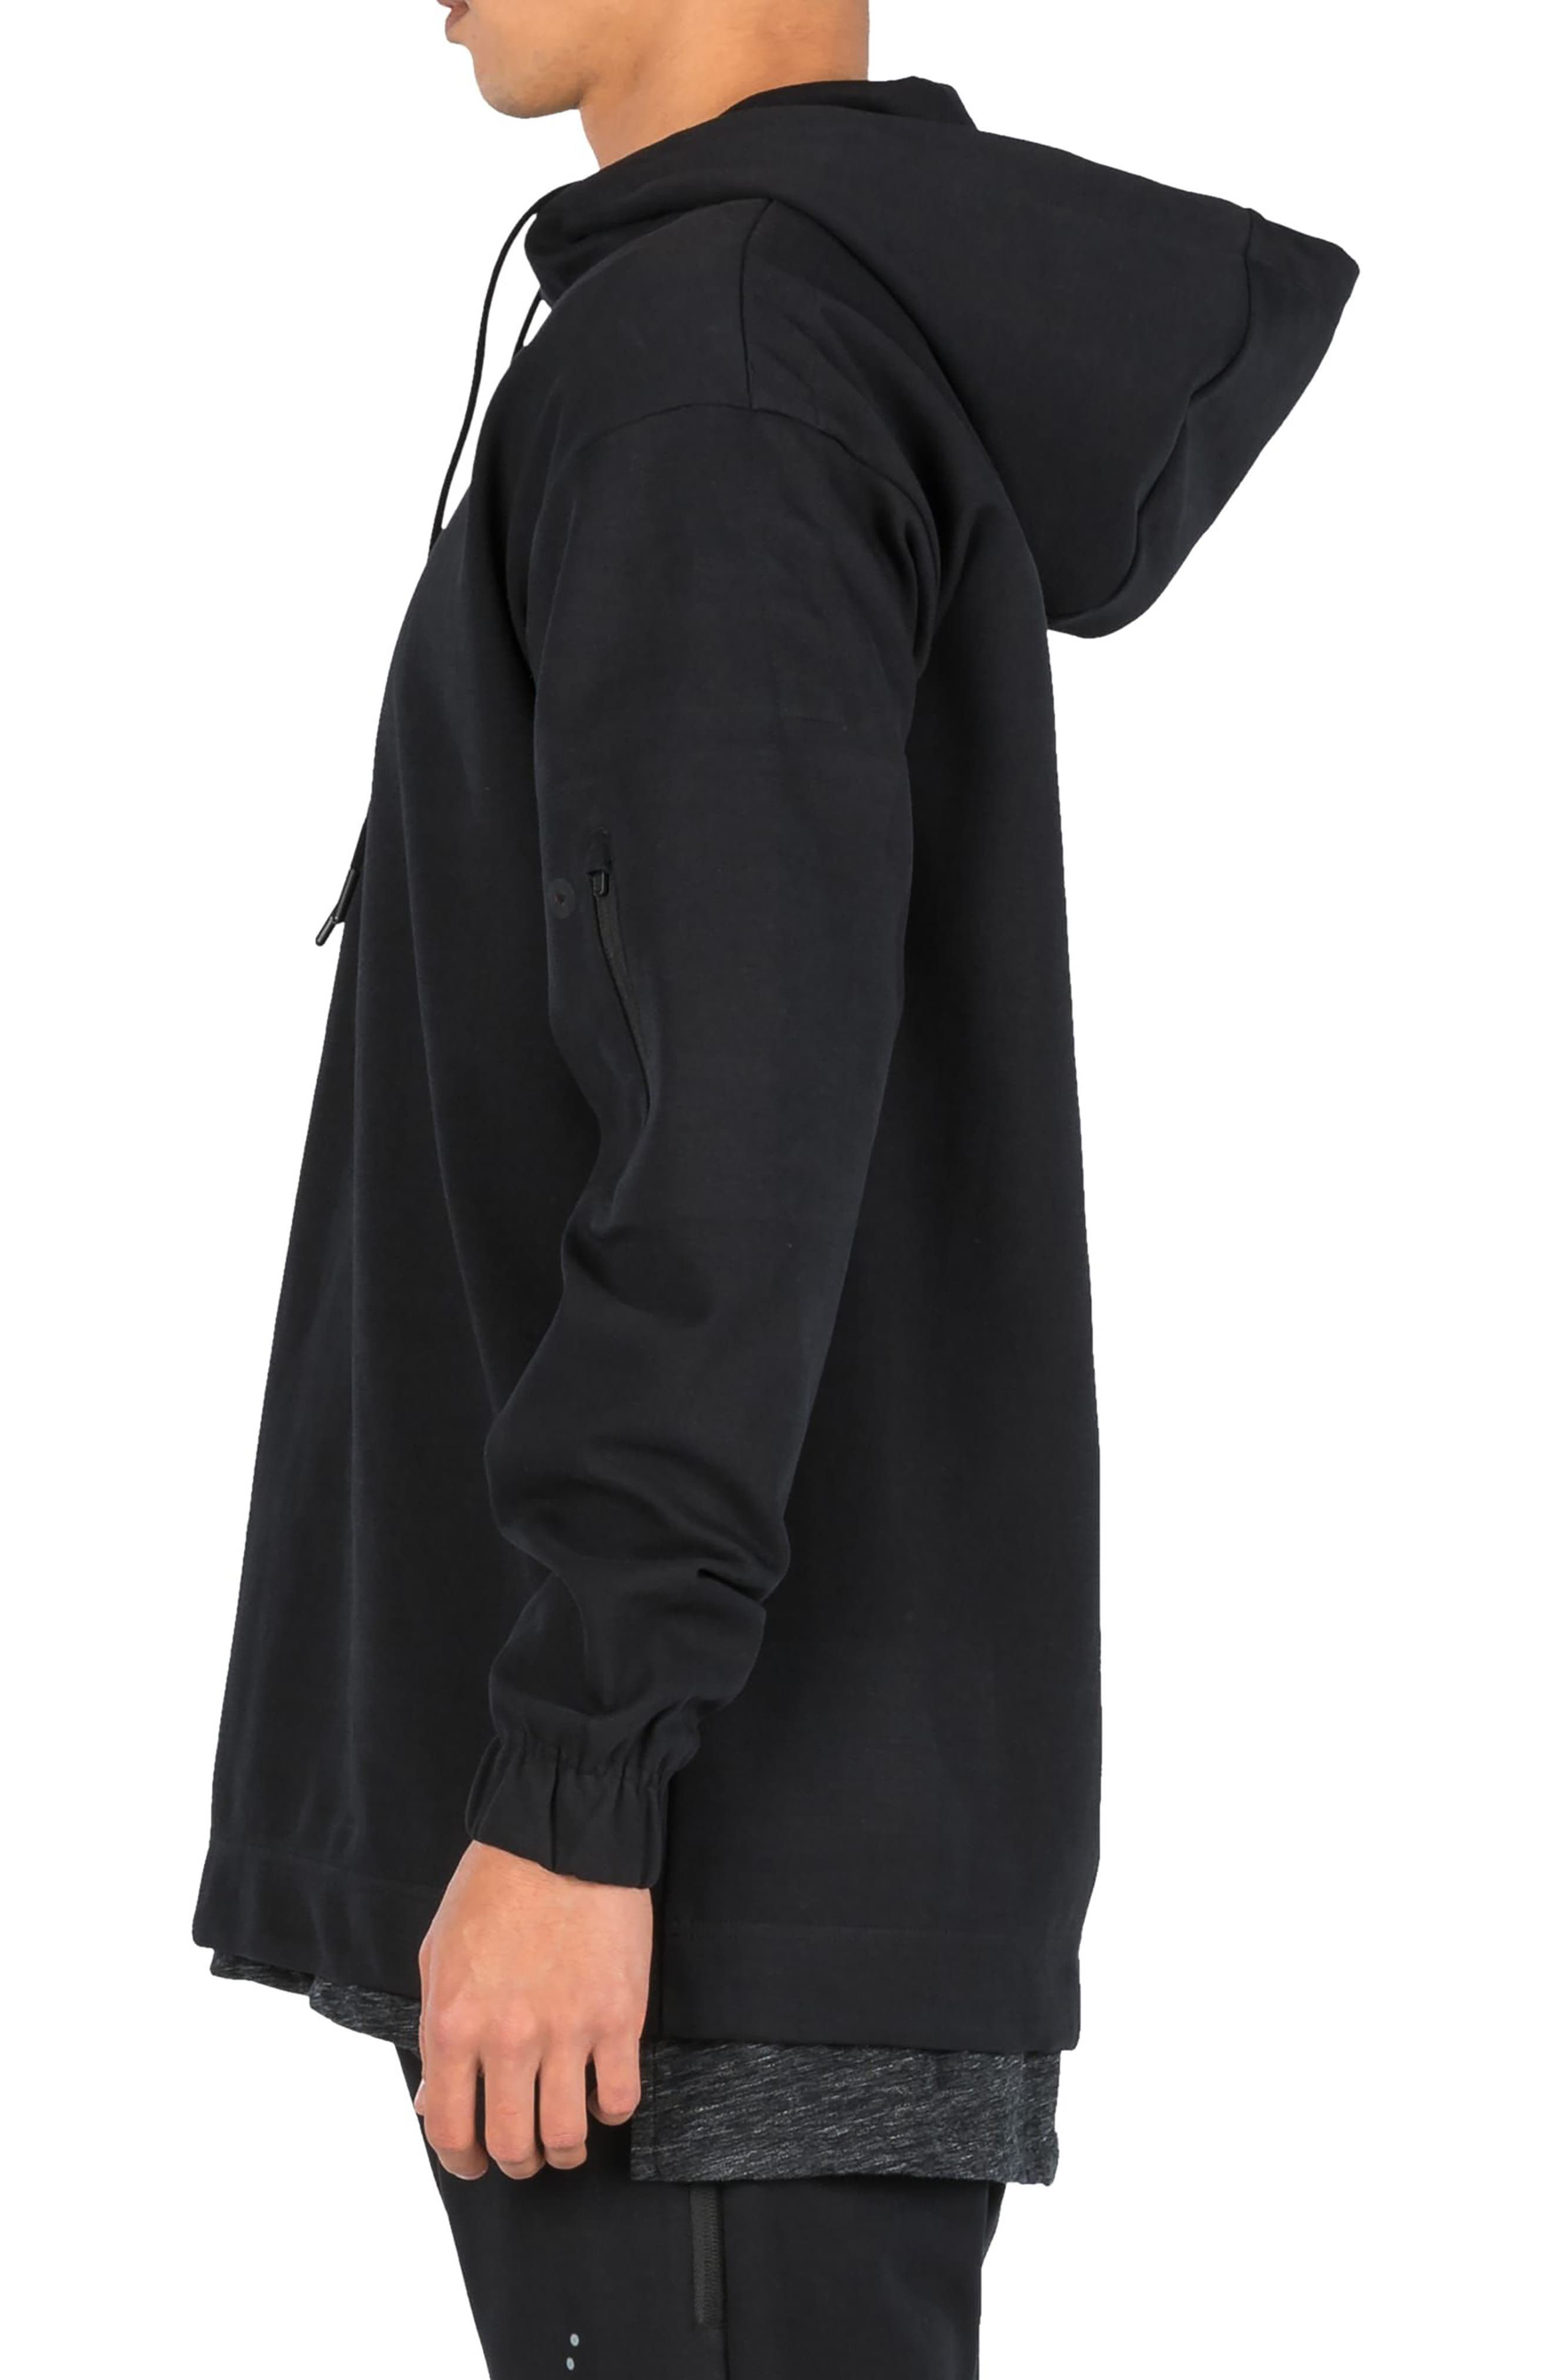 Alternate Image 3  - ZANEROBE REC Tech Hoodie Sweatshirt